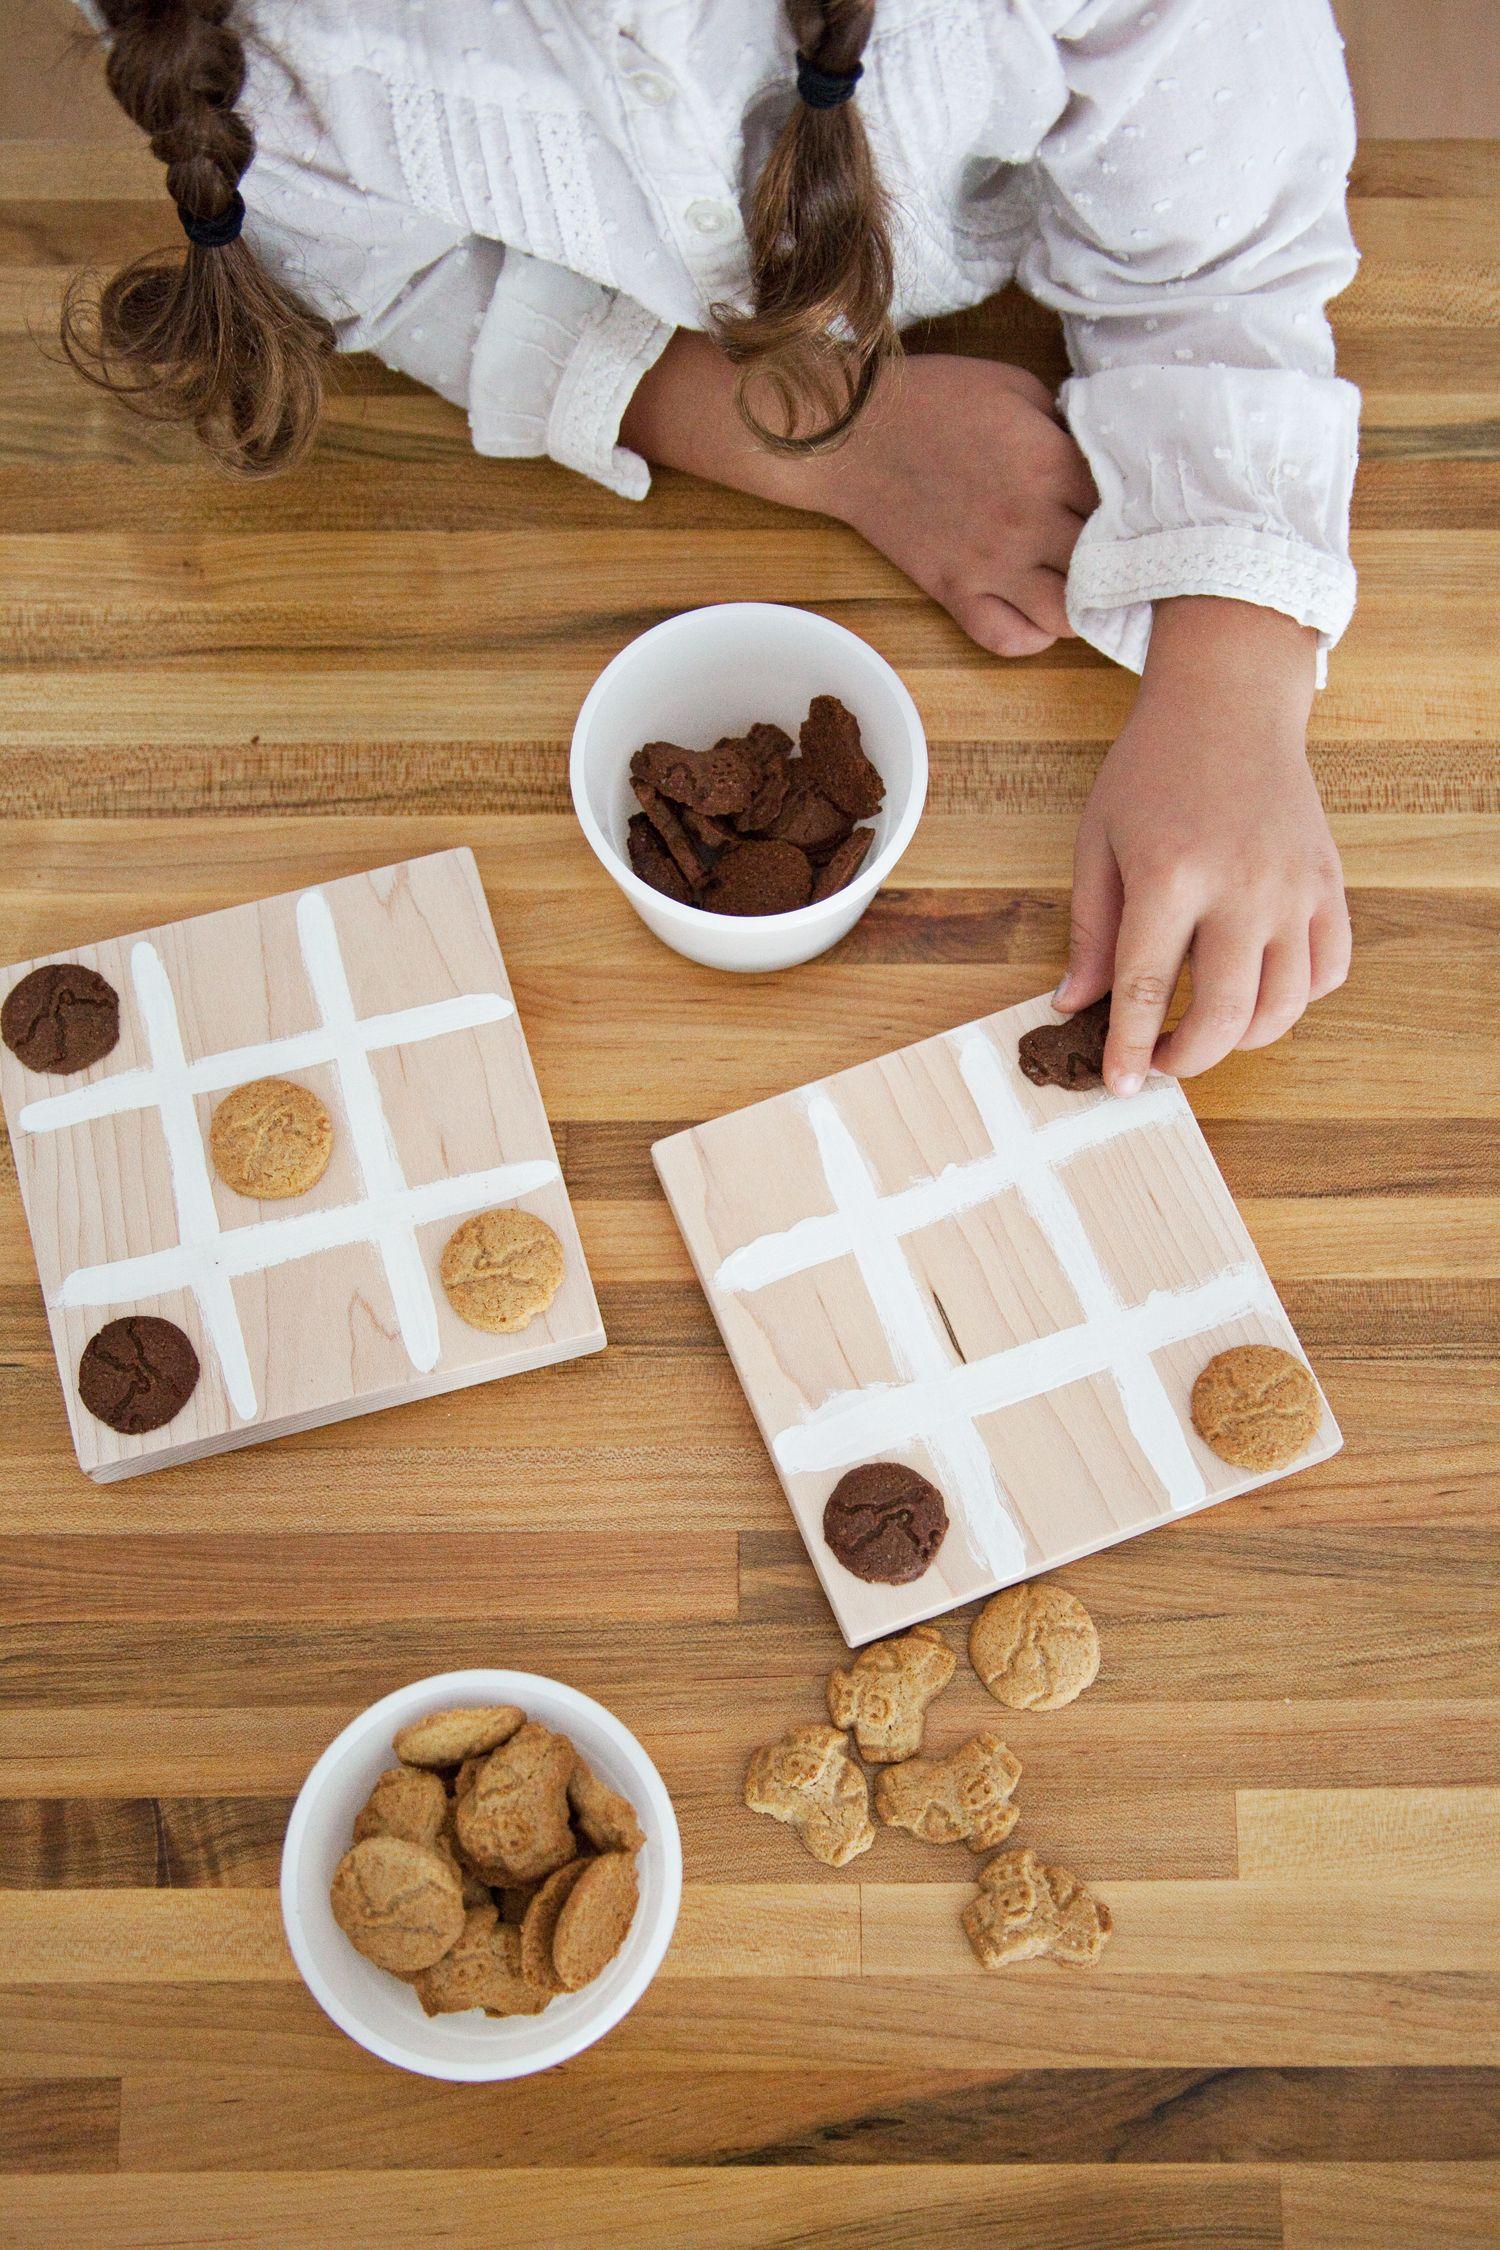 KIDDO CRAFT Kids food crafts, Game snacks, Snack board